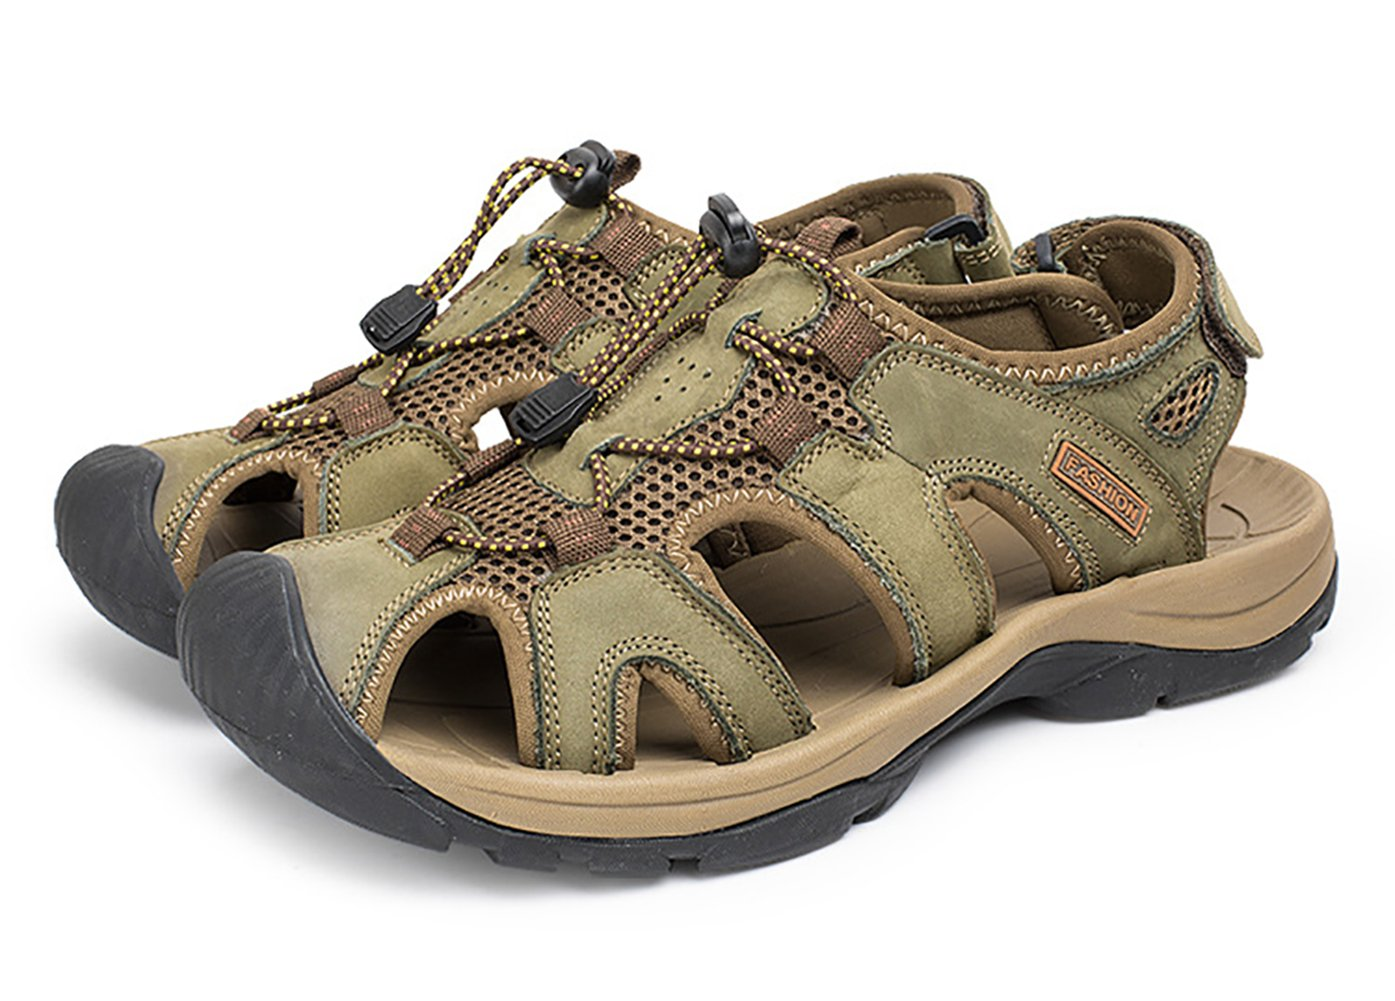 Sk Studio En Fermées Cuir De Chaussures Sandales Homme Outdoor zVpqUjGLMS